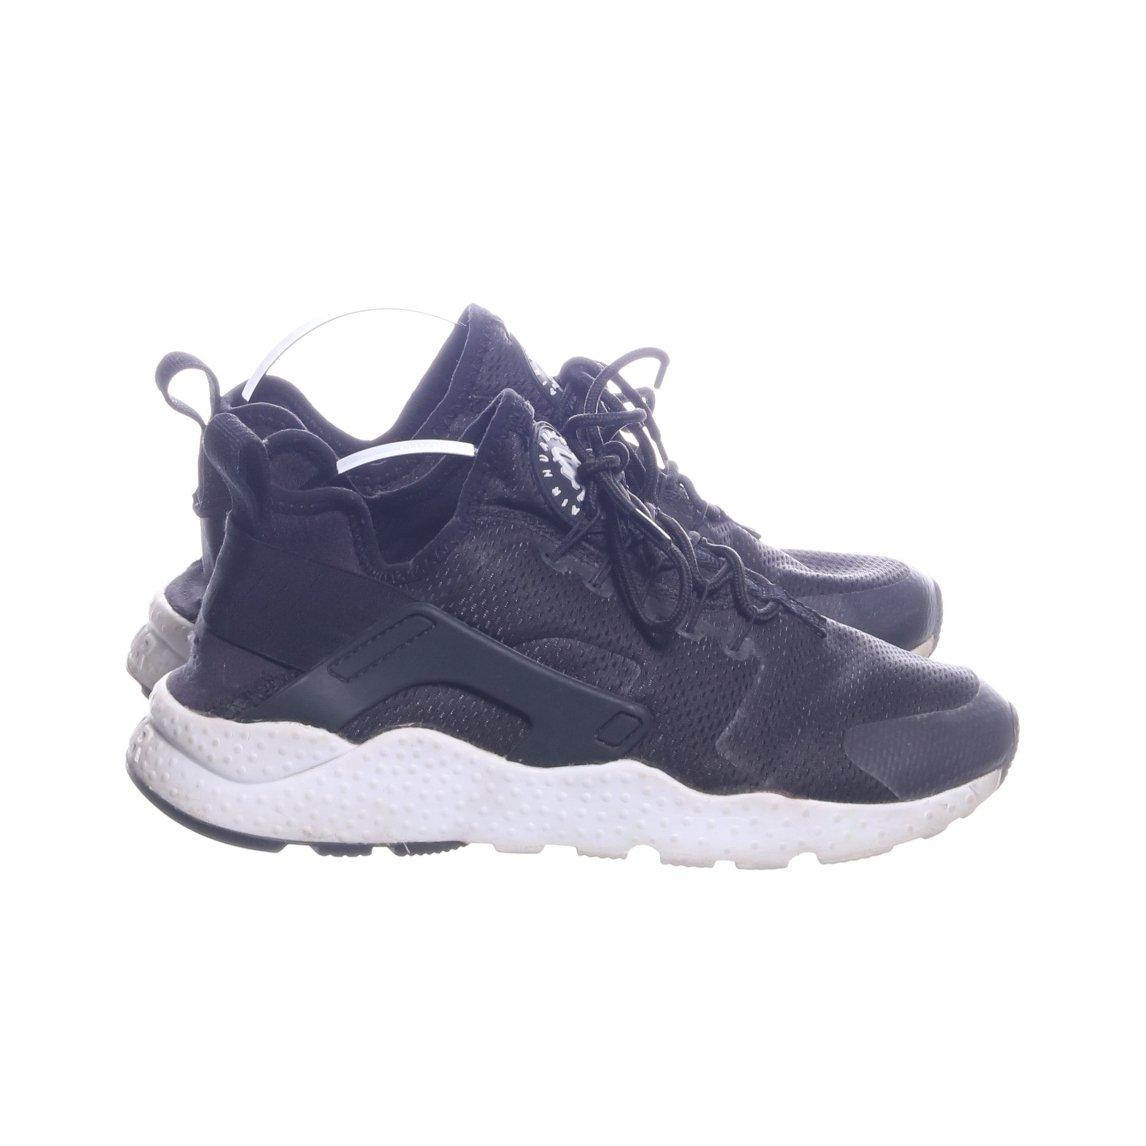 new style 245f9 e33d9 Nike, Sneakers, Strl  38,5, Air Huarache, Svart